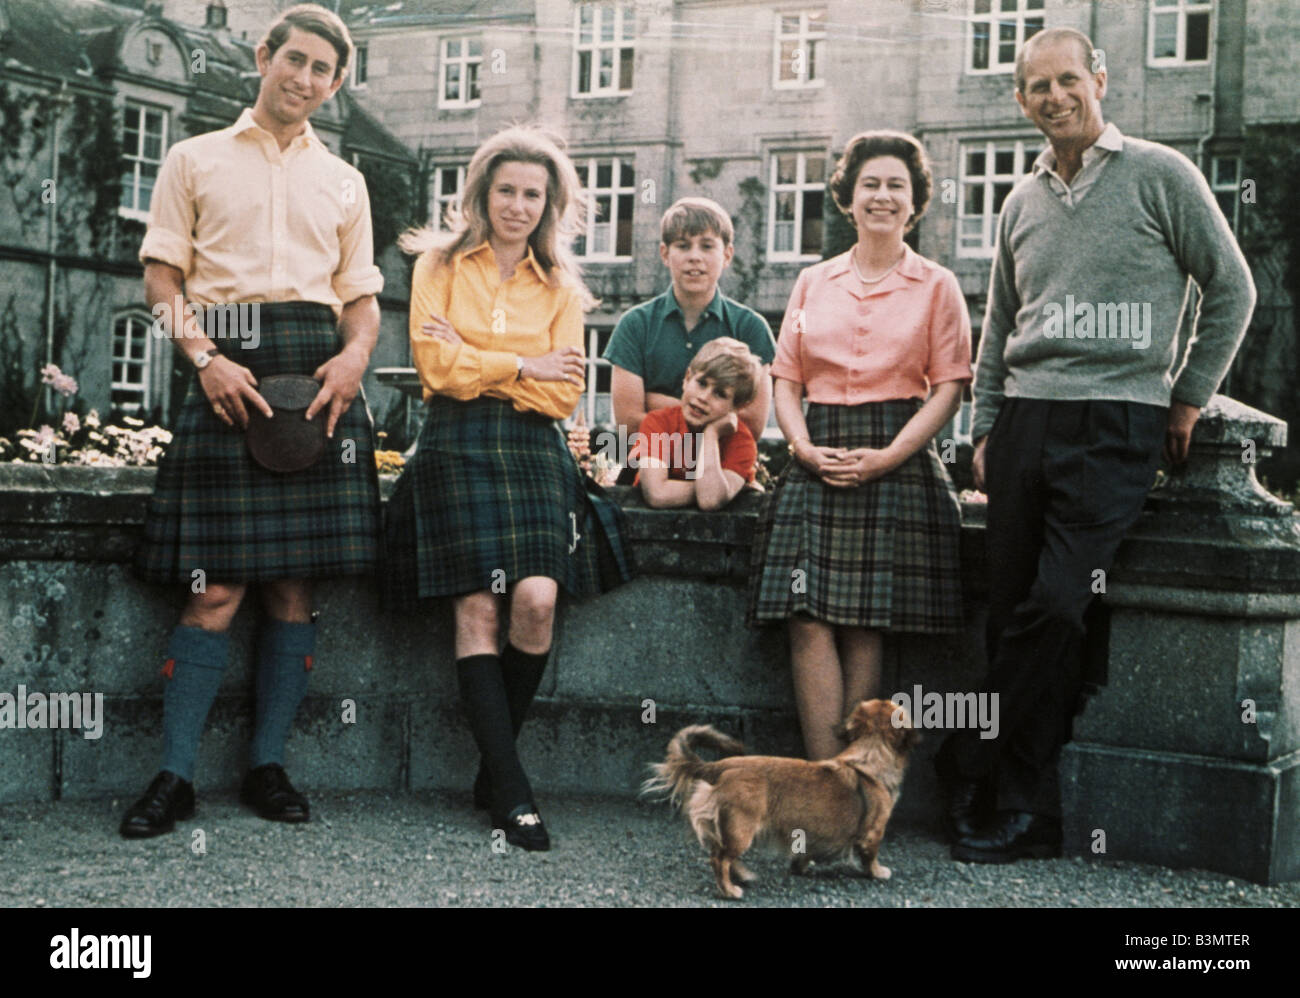 Königin ELIZABETH II im Balmoral mit Prinz Charles, Prinzessin Anne, Prinz Edward, Prinz Andrew und Prinz Phillip Stockbild